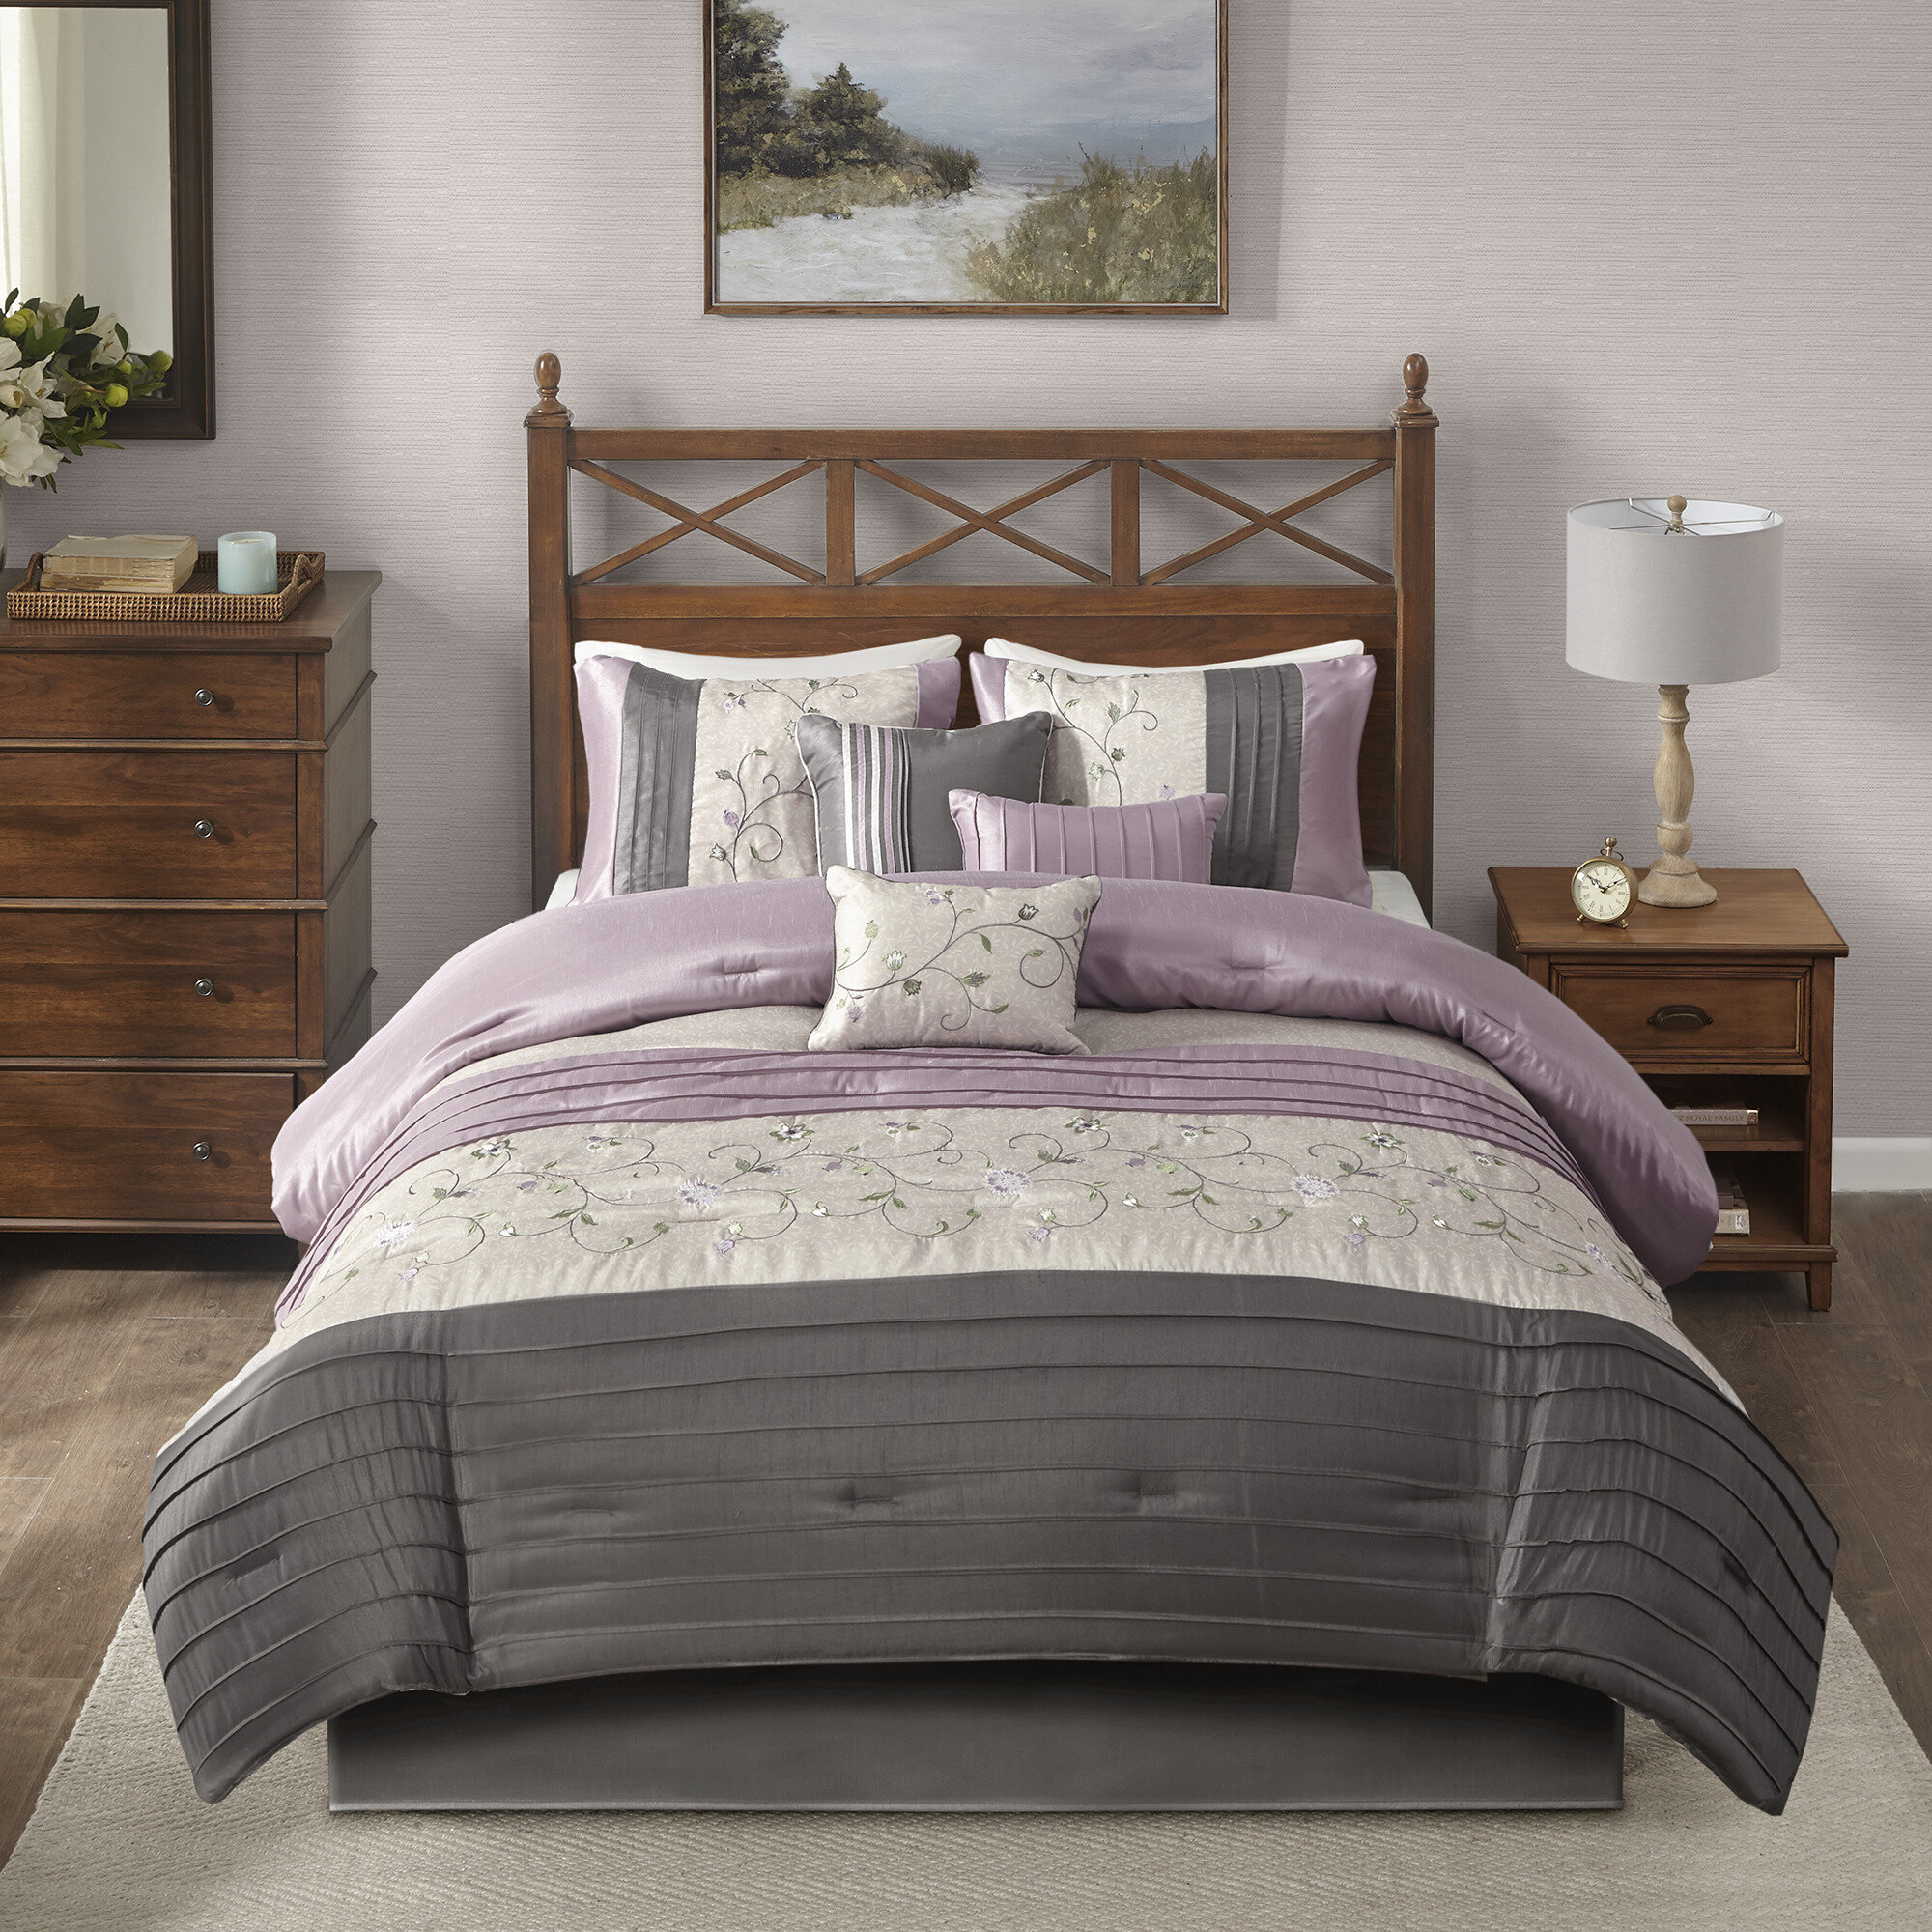 Purple Set Comforters Sets You Ll Love In 2021 Wayfair